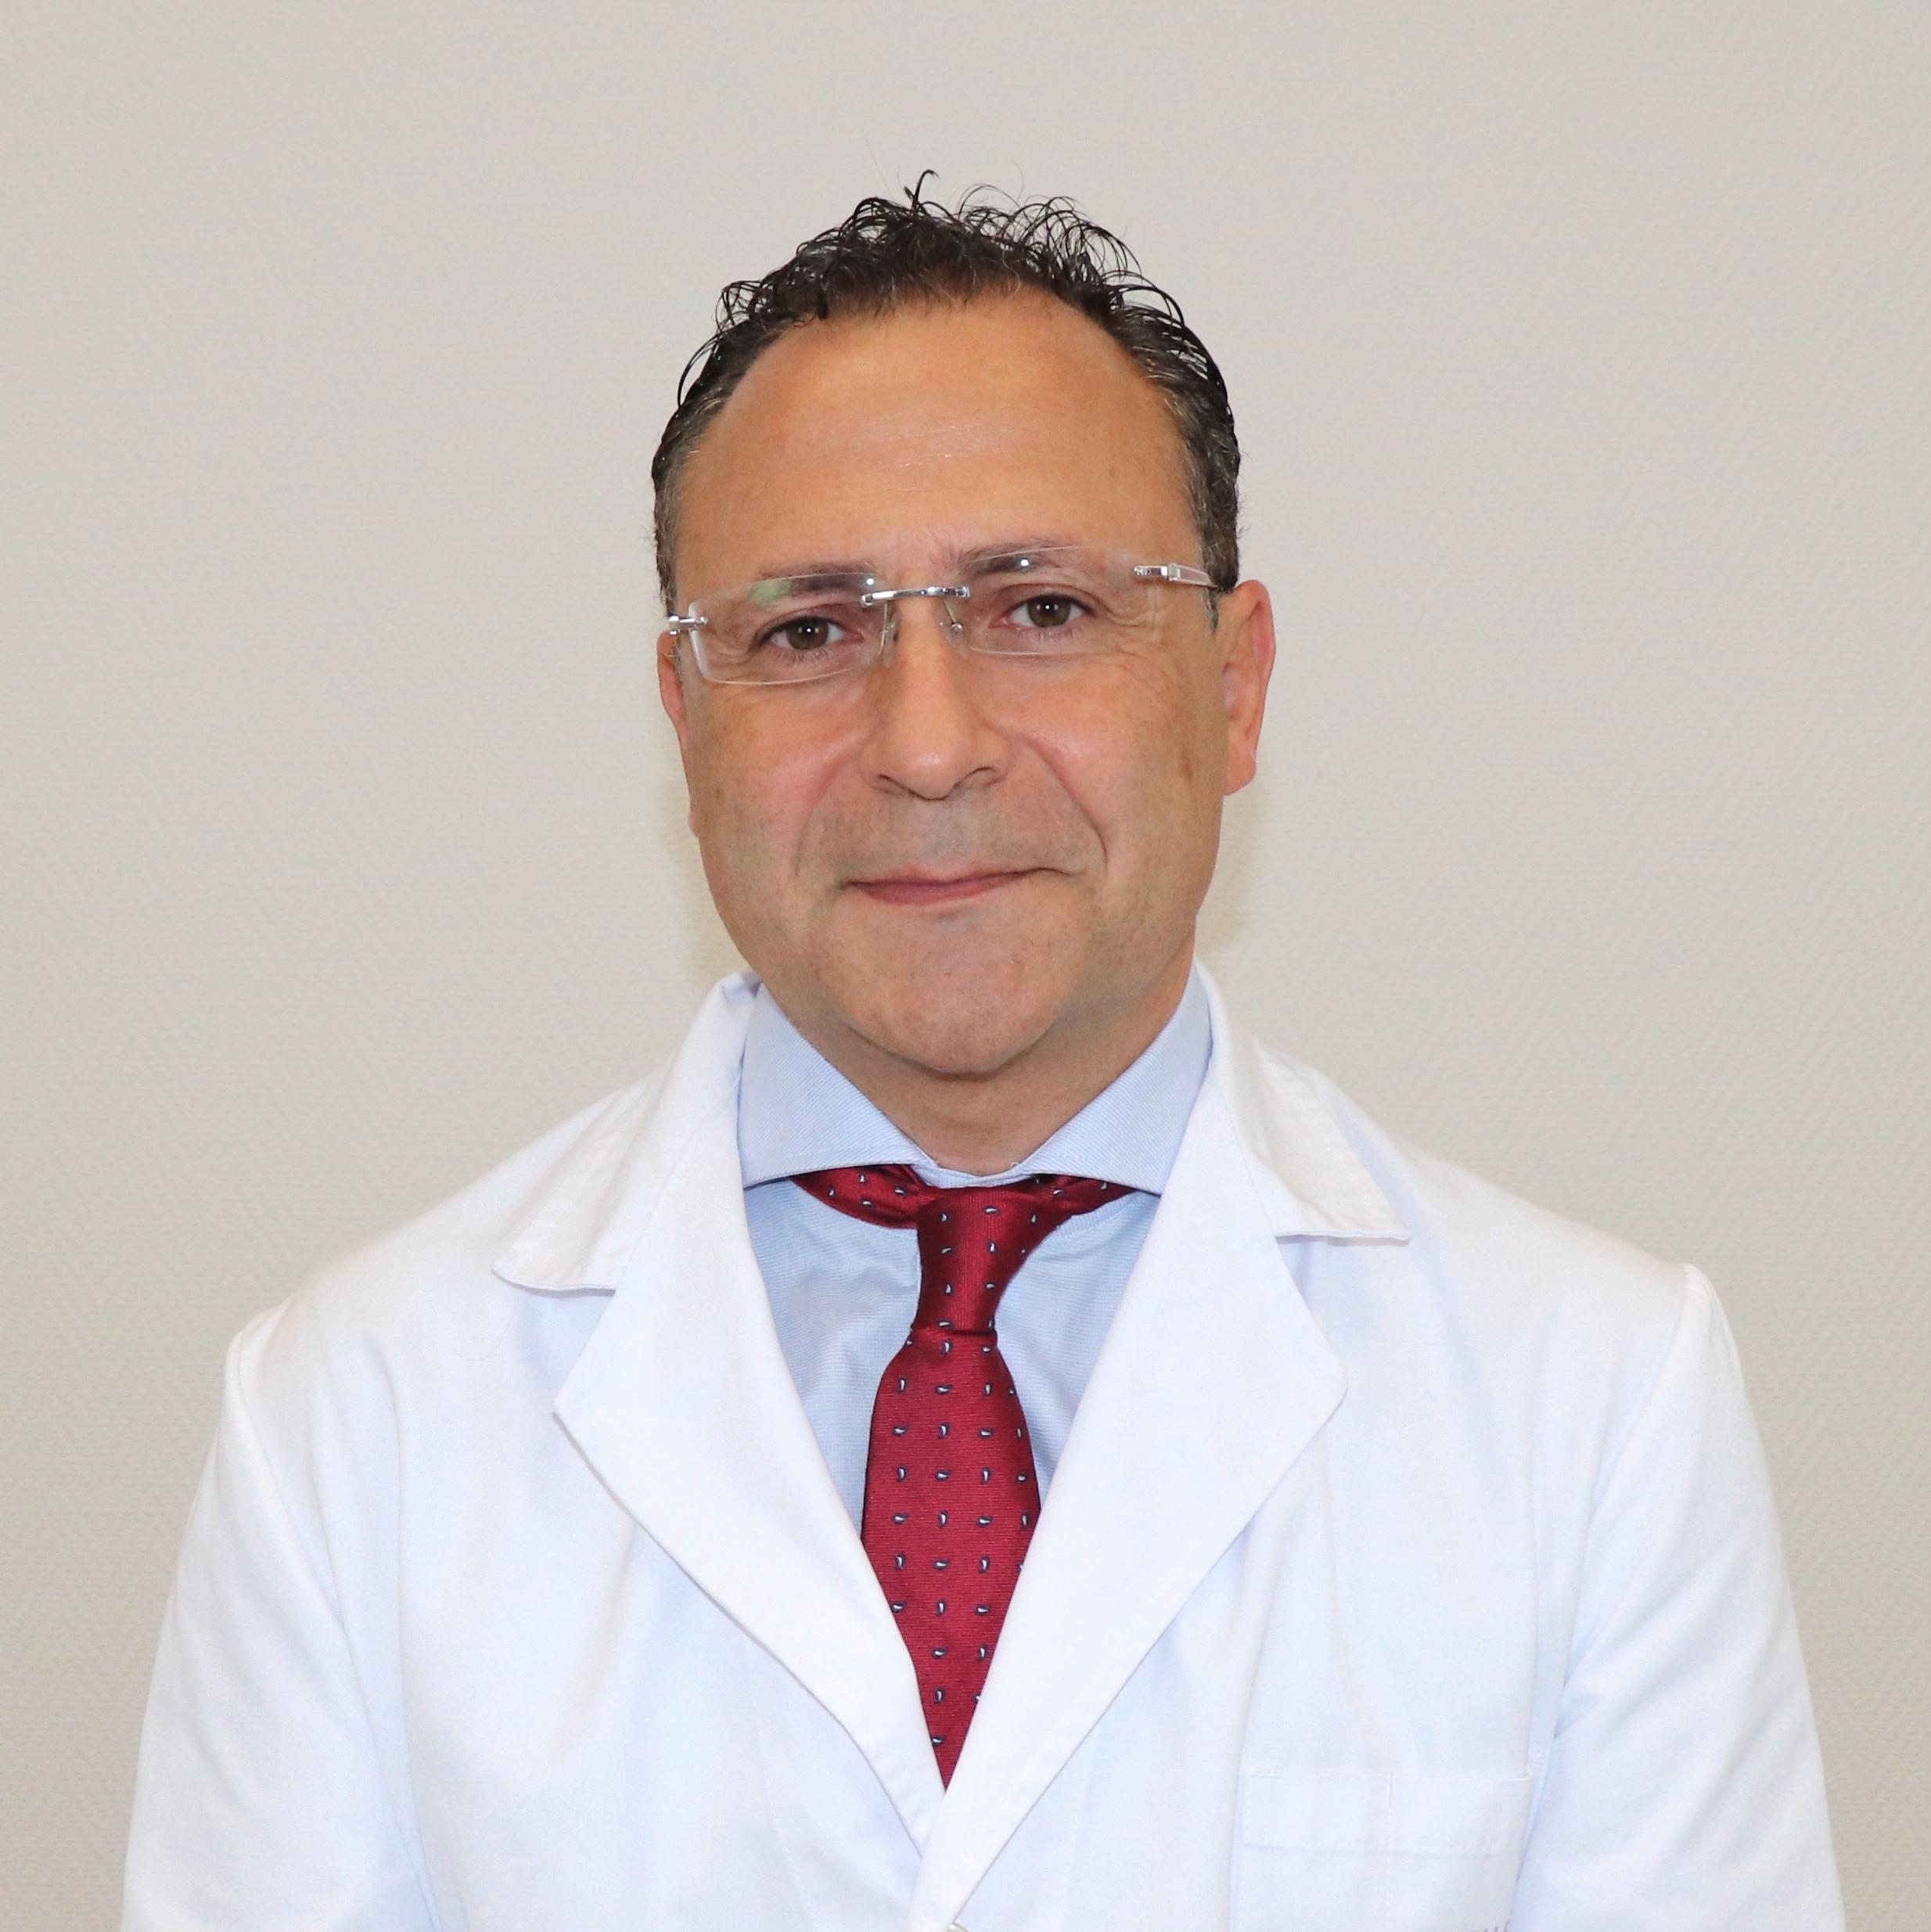 Carlos Fernández Quesada